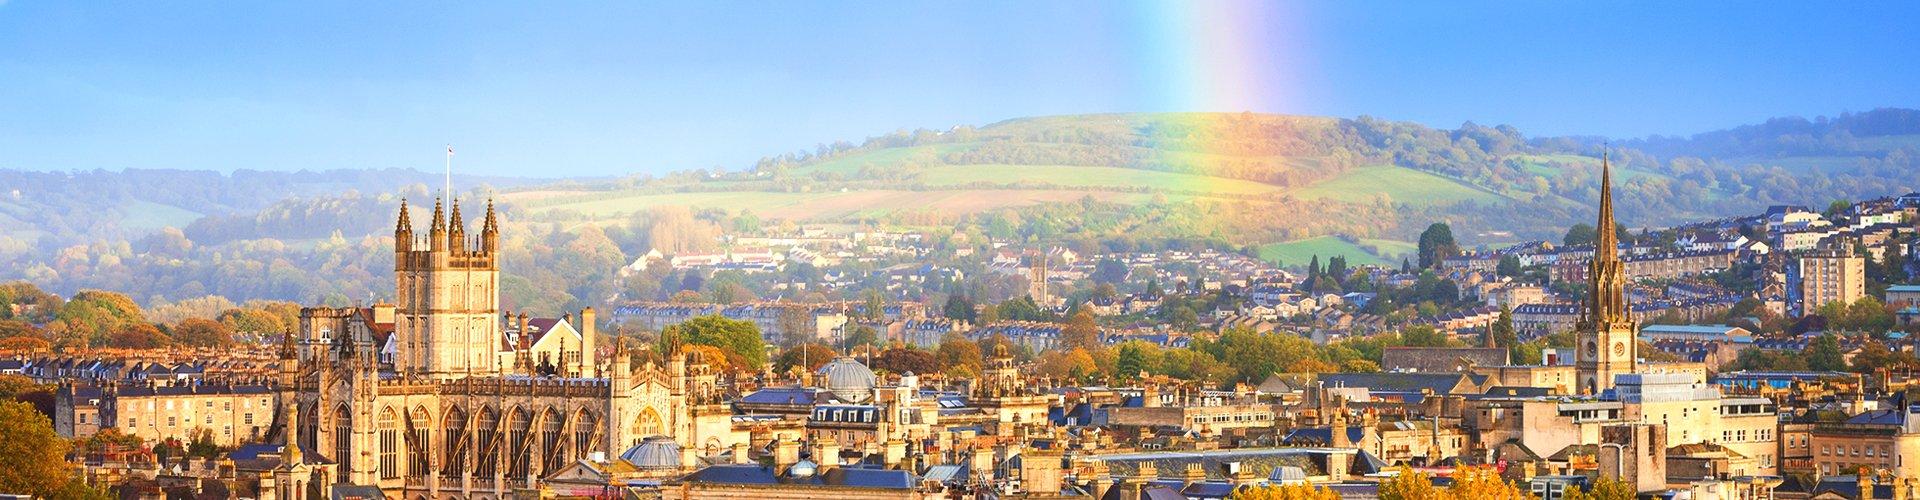 Skyline van Bath, Groot-Brittannië